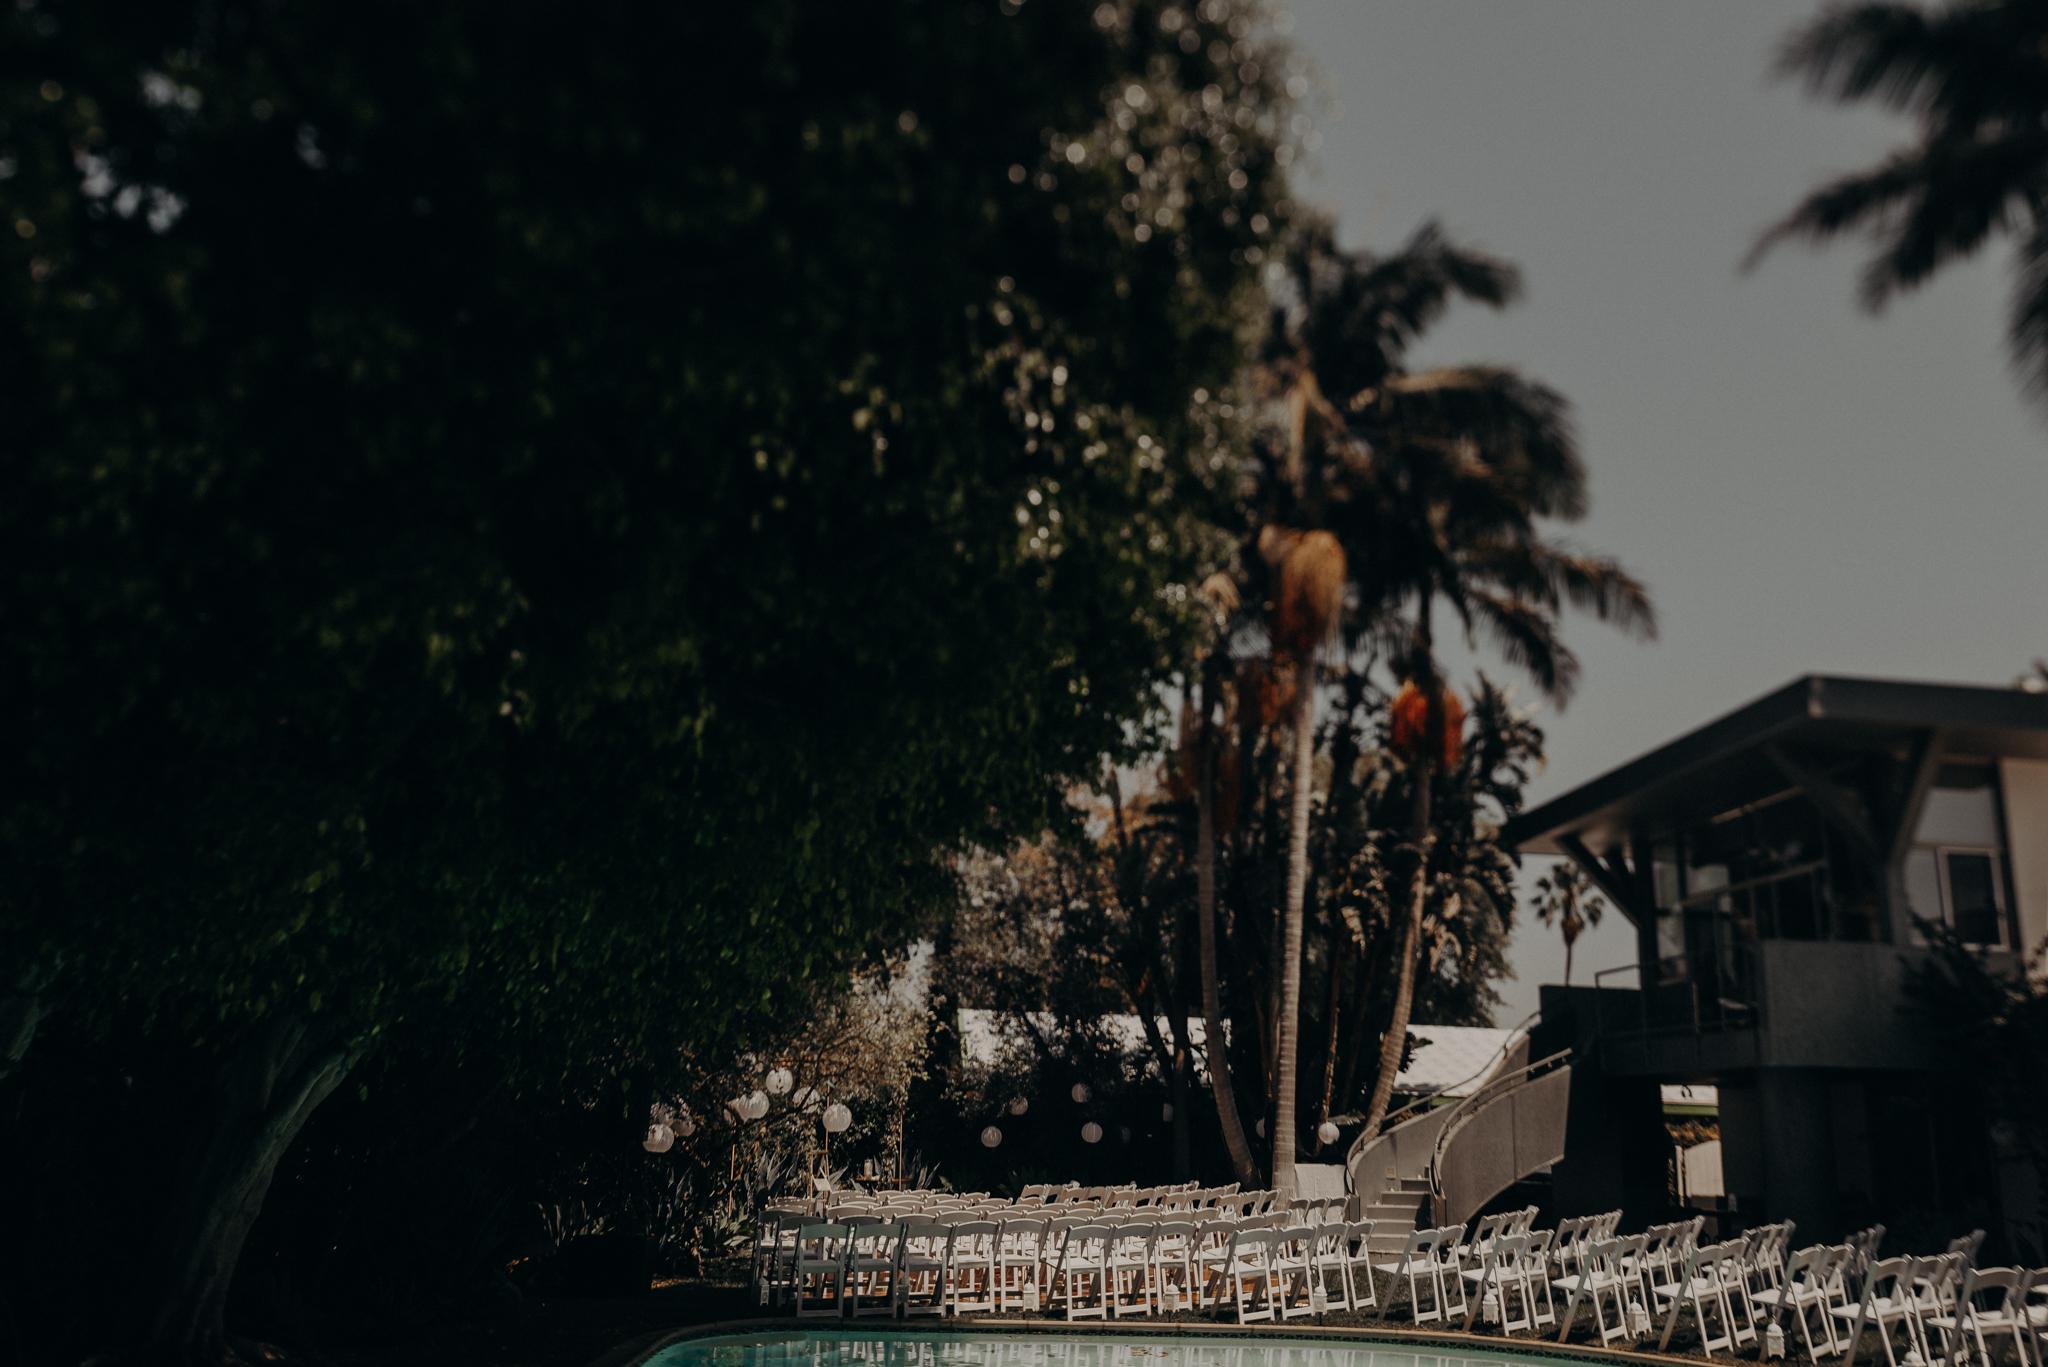 Isaiah + Taylor Photography - Private Estate Backyard Wedding - Beverly Hills - Los Angeles Wedding Photographer - 63.jpg